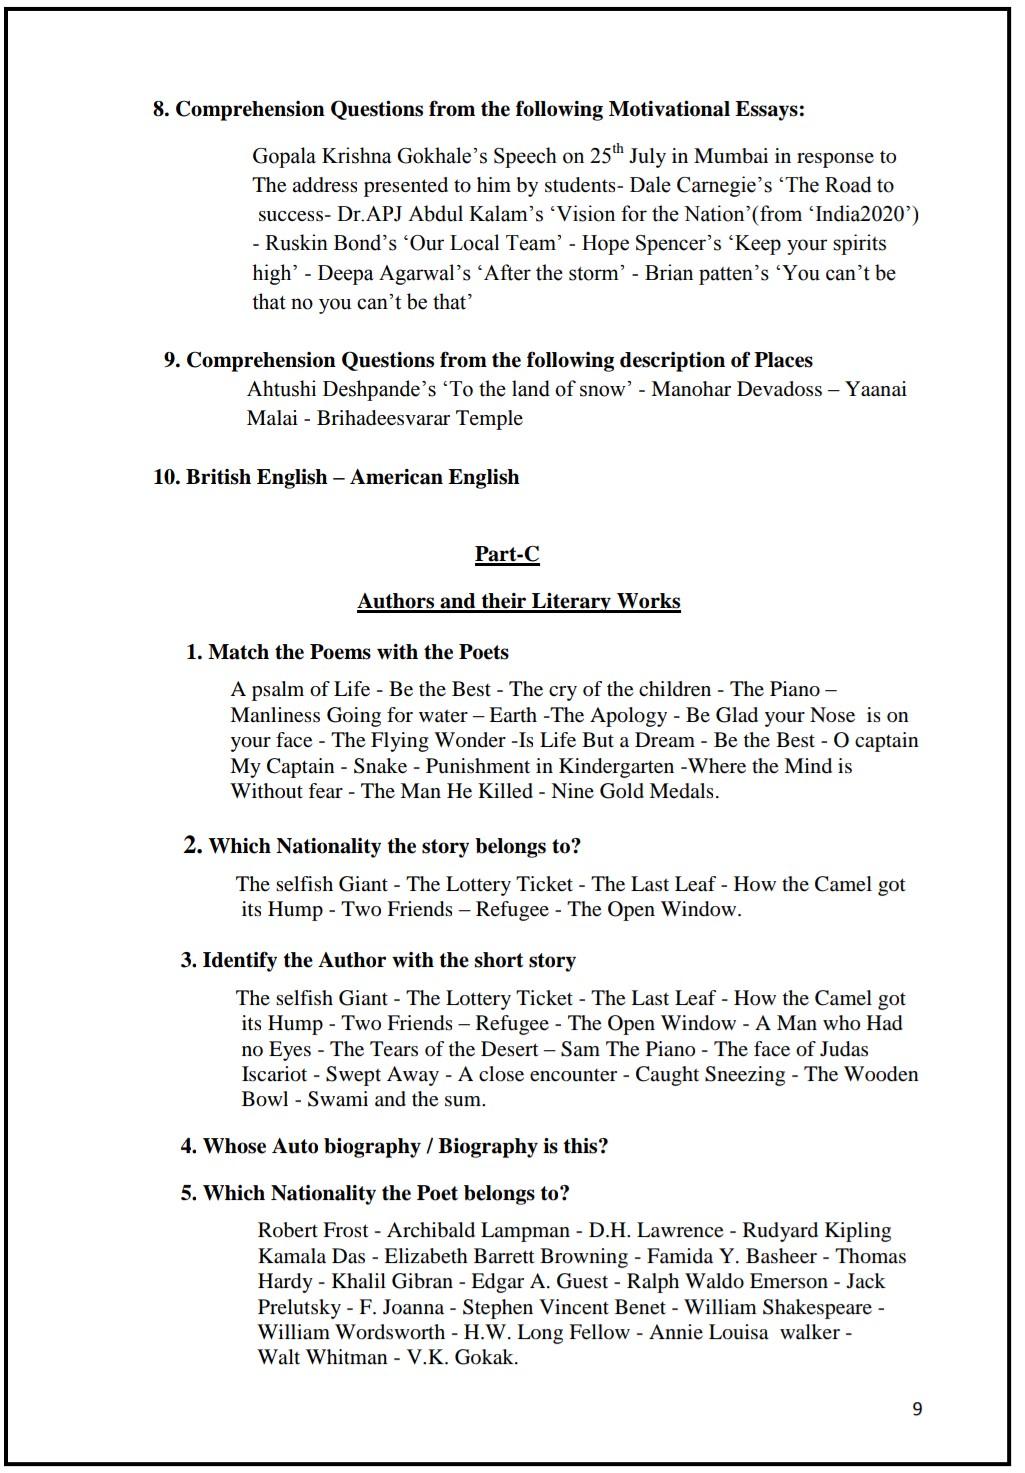 TNPSC Group 4 Syllabus | தமிழ்நாடு பொது சேவை ஆணையம் TNPSC குரூப் 4 -பாடத்திட்டம் |_120.1